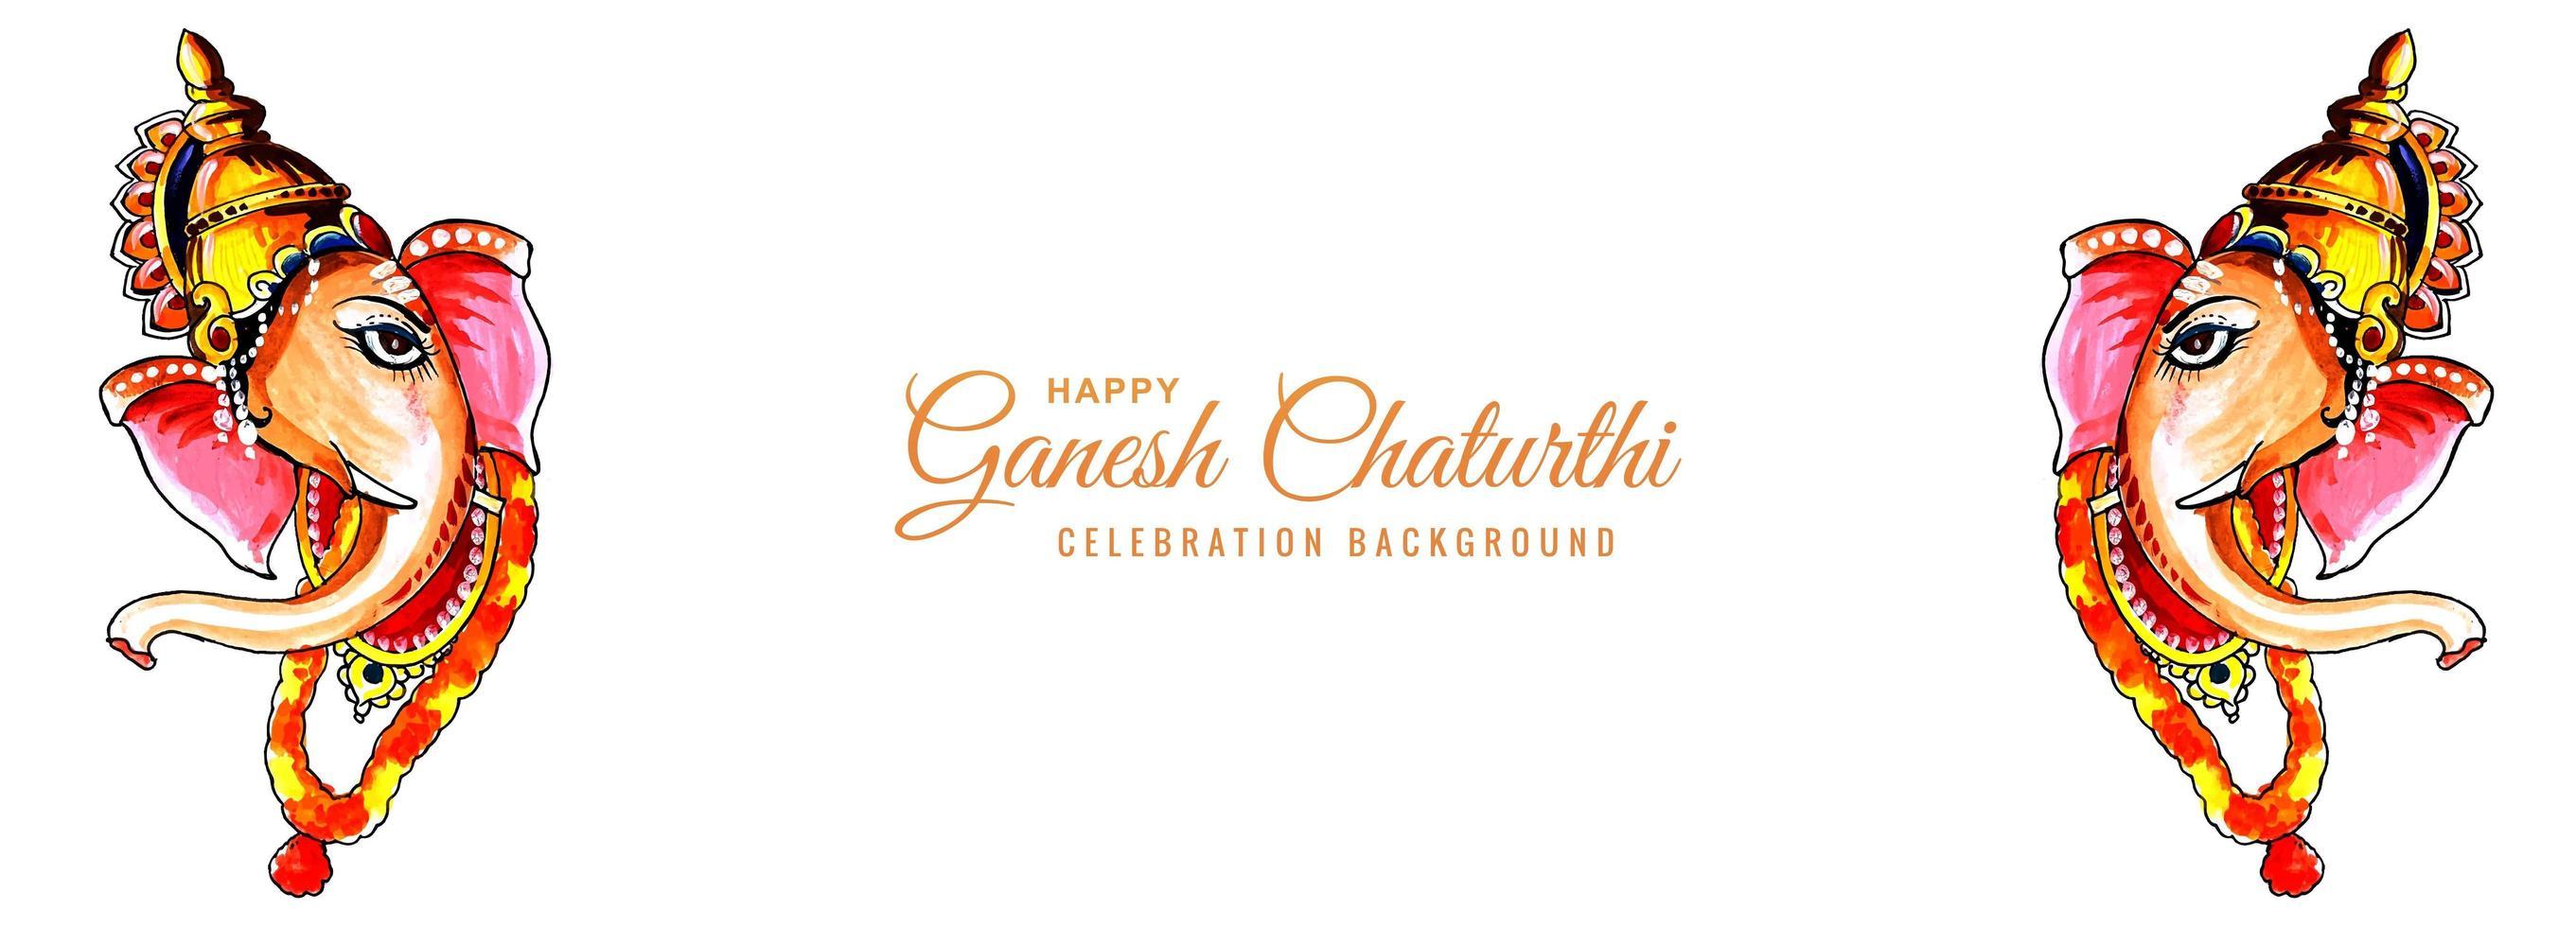 aquarel lord ganesh voor ganesh chaturthi banner vector